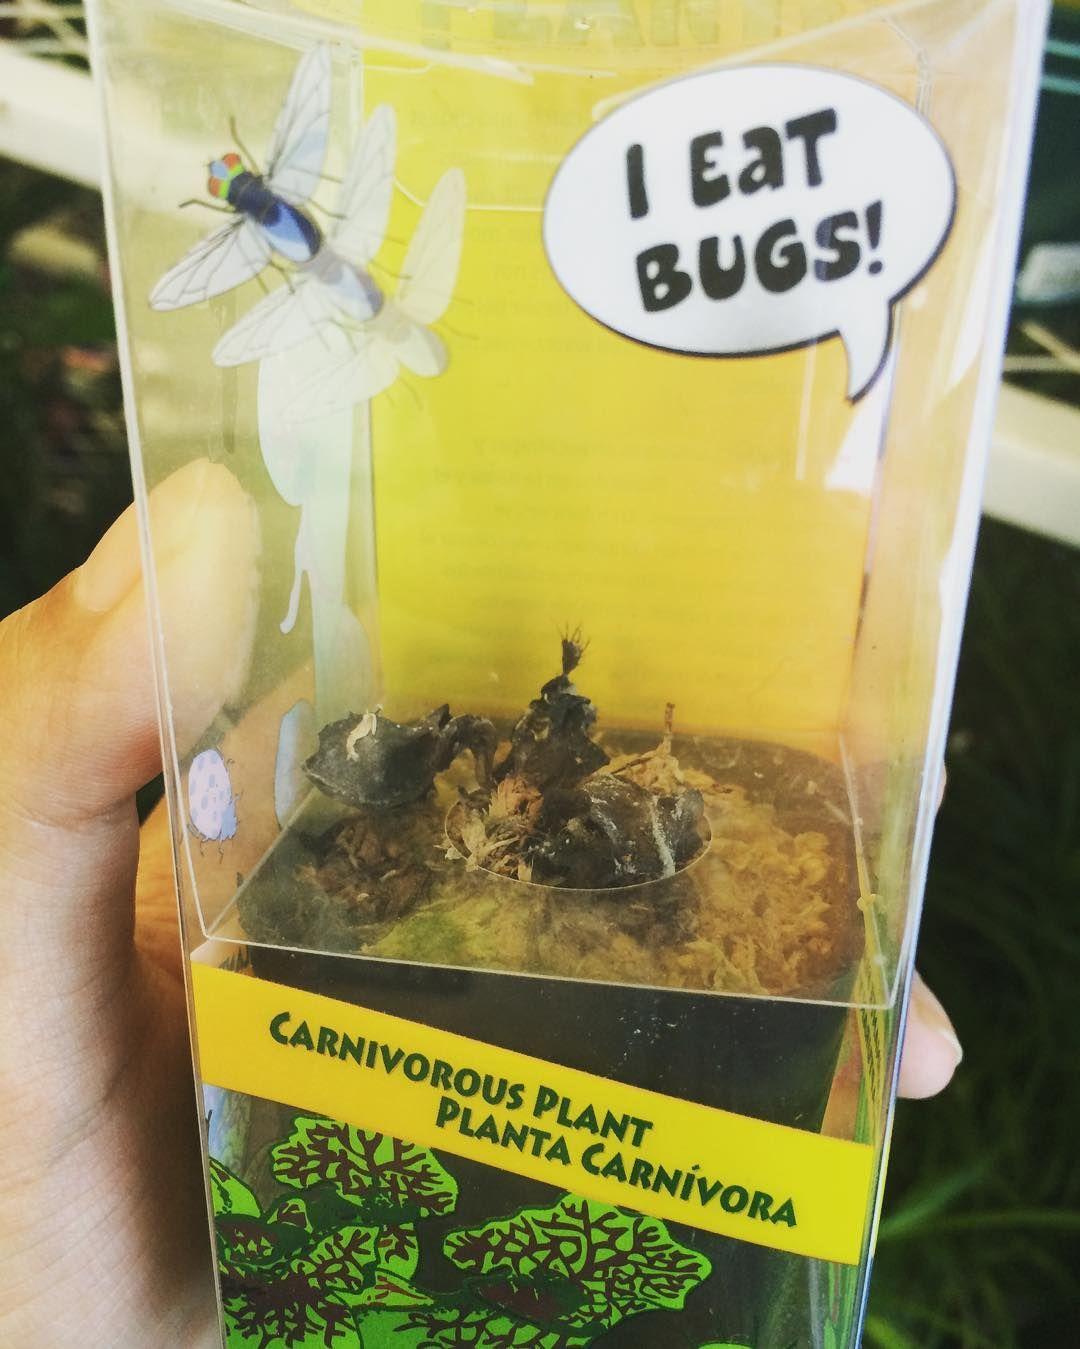 Poor venus flytrap at lowes #carnivorousplant #dead #lowes #venusflytrap #deadplant by dive_into_nature